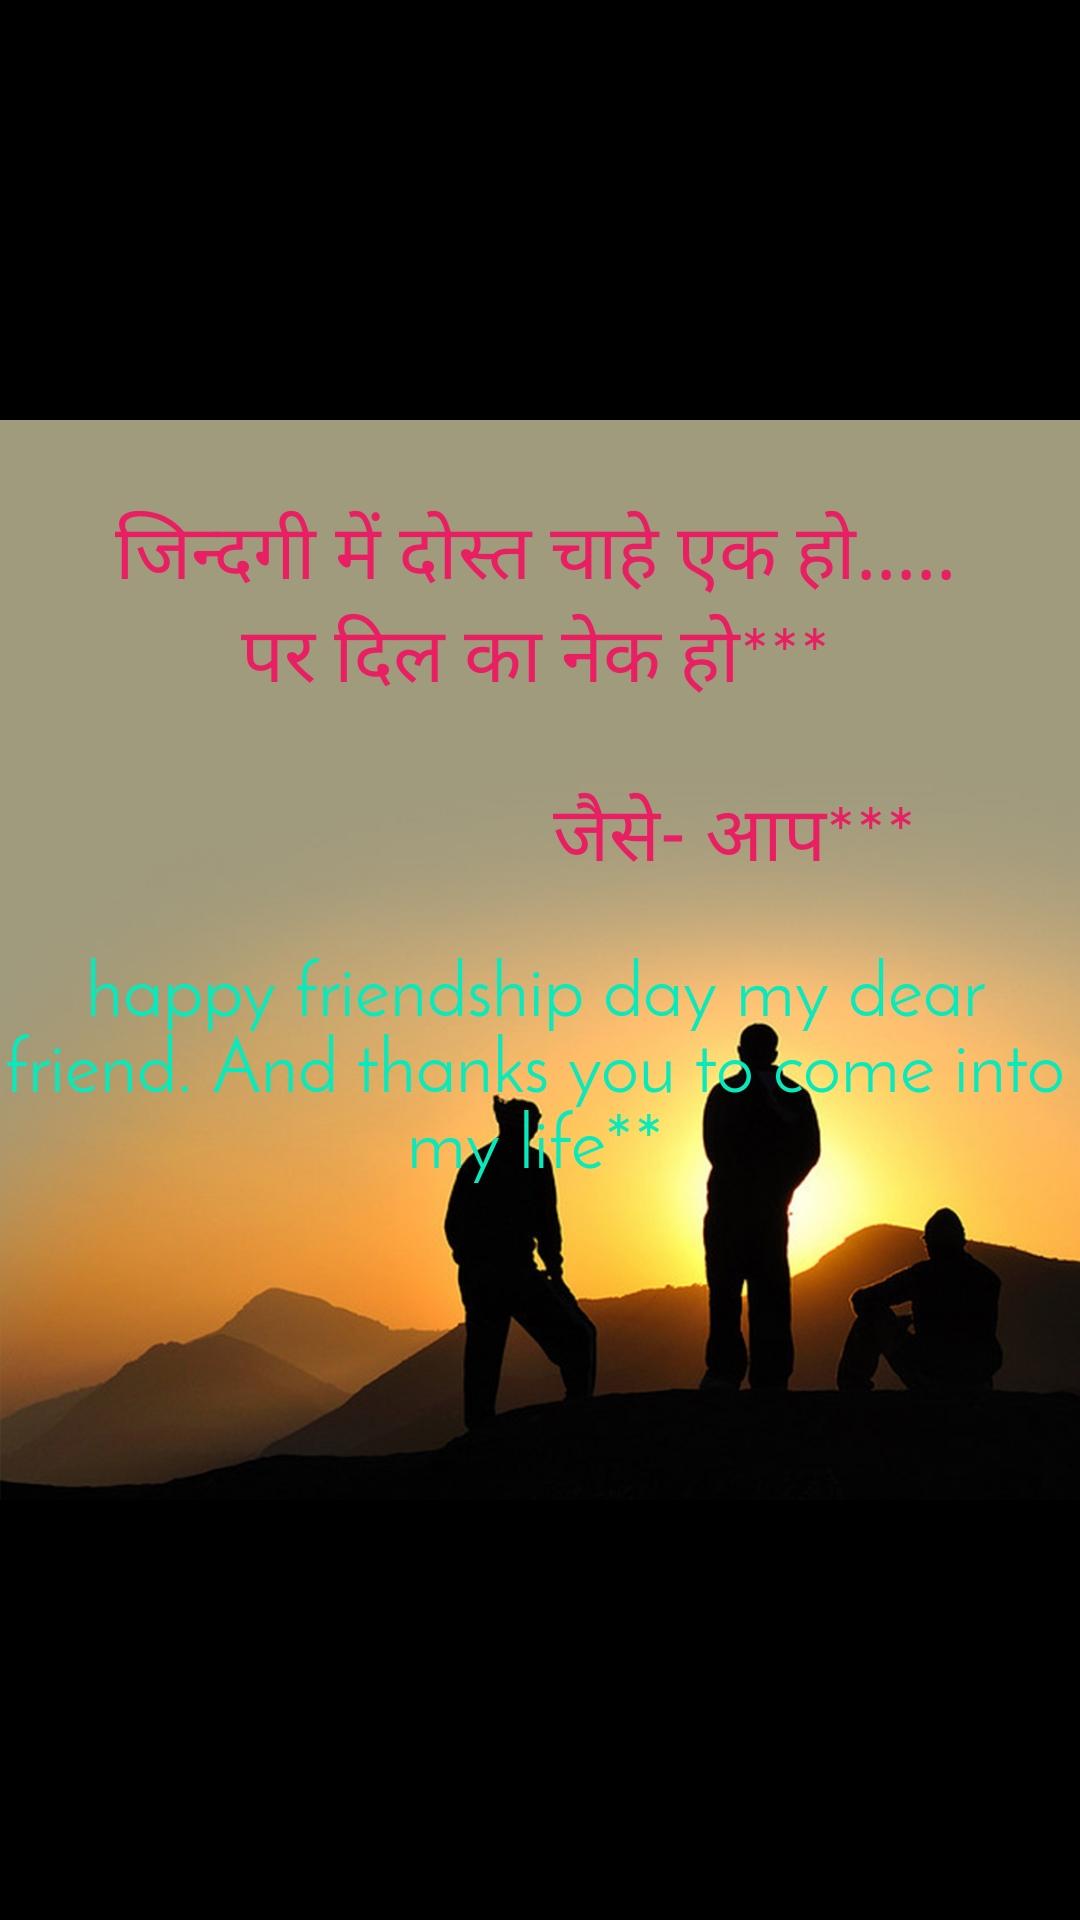 जिन्दगी में दोस्त चाहे एक हो..... पर दिल का नेक हो***                       जैसे- आप***   happy friendship day my dear friend. And thanks you to come into my life**